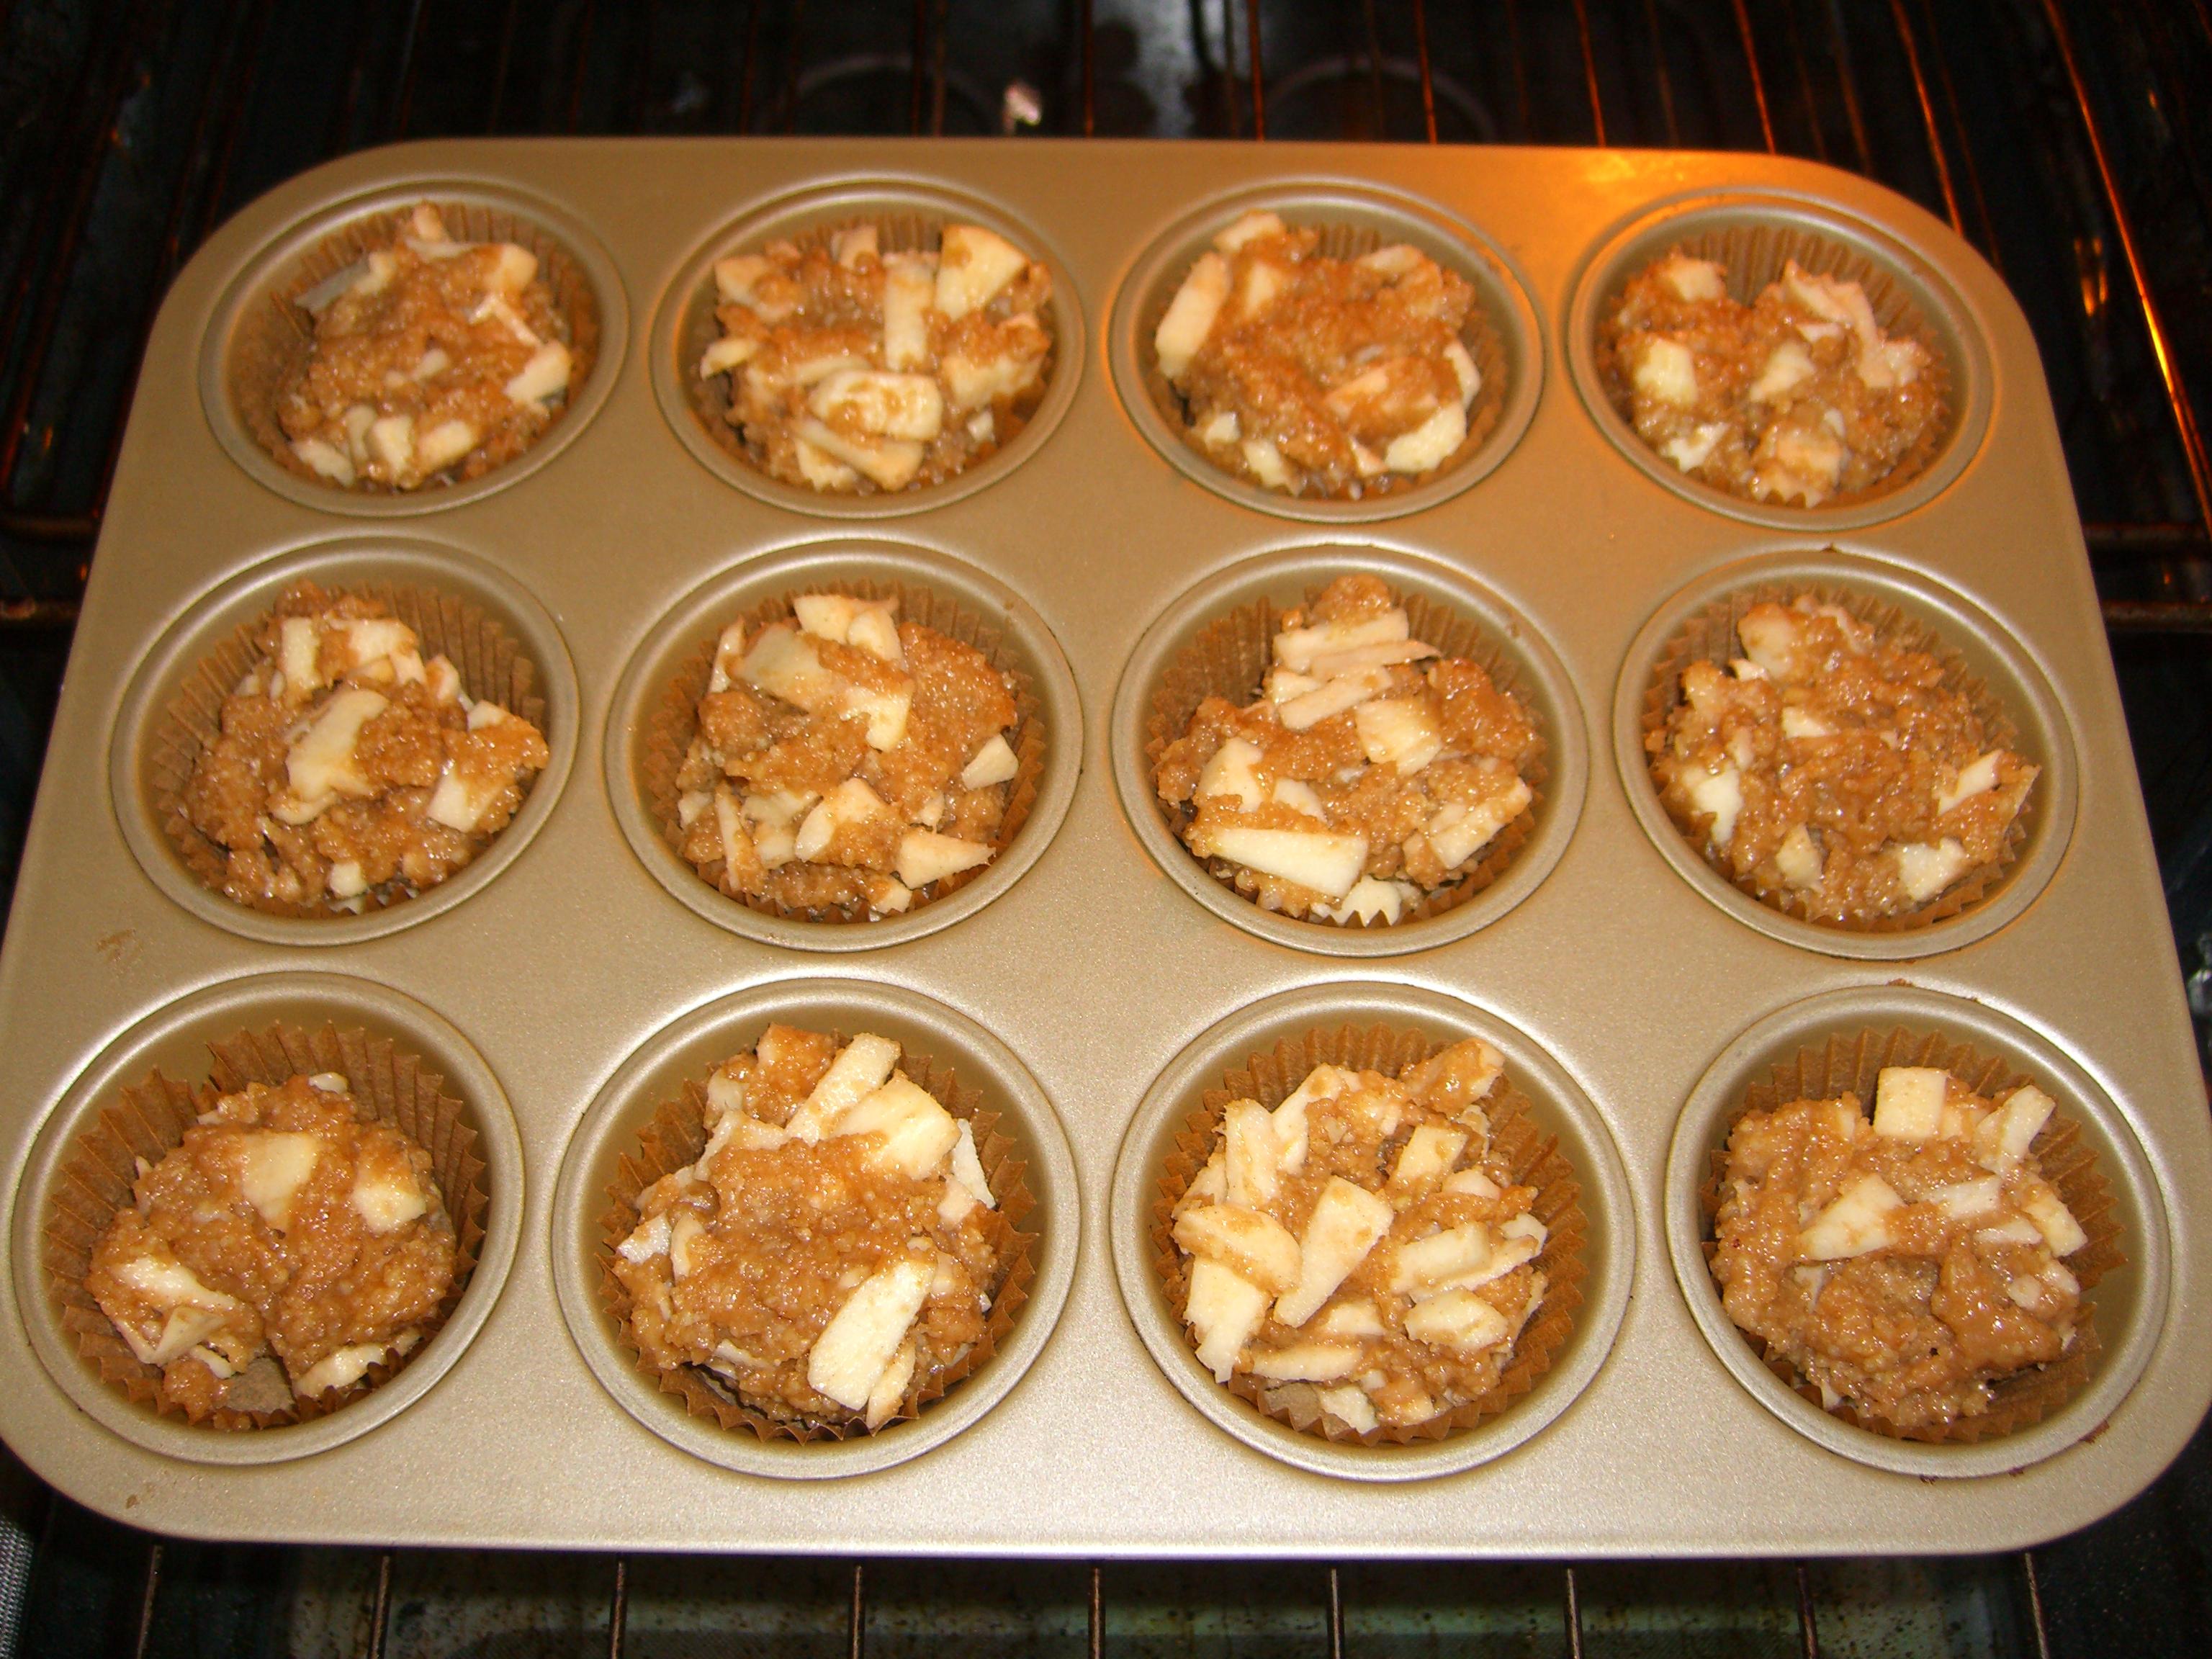 cinnamon muffins apple cinnamon muffins warm apple cinnamon muffin ...